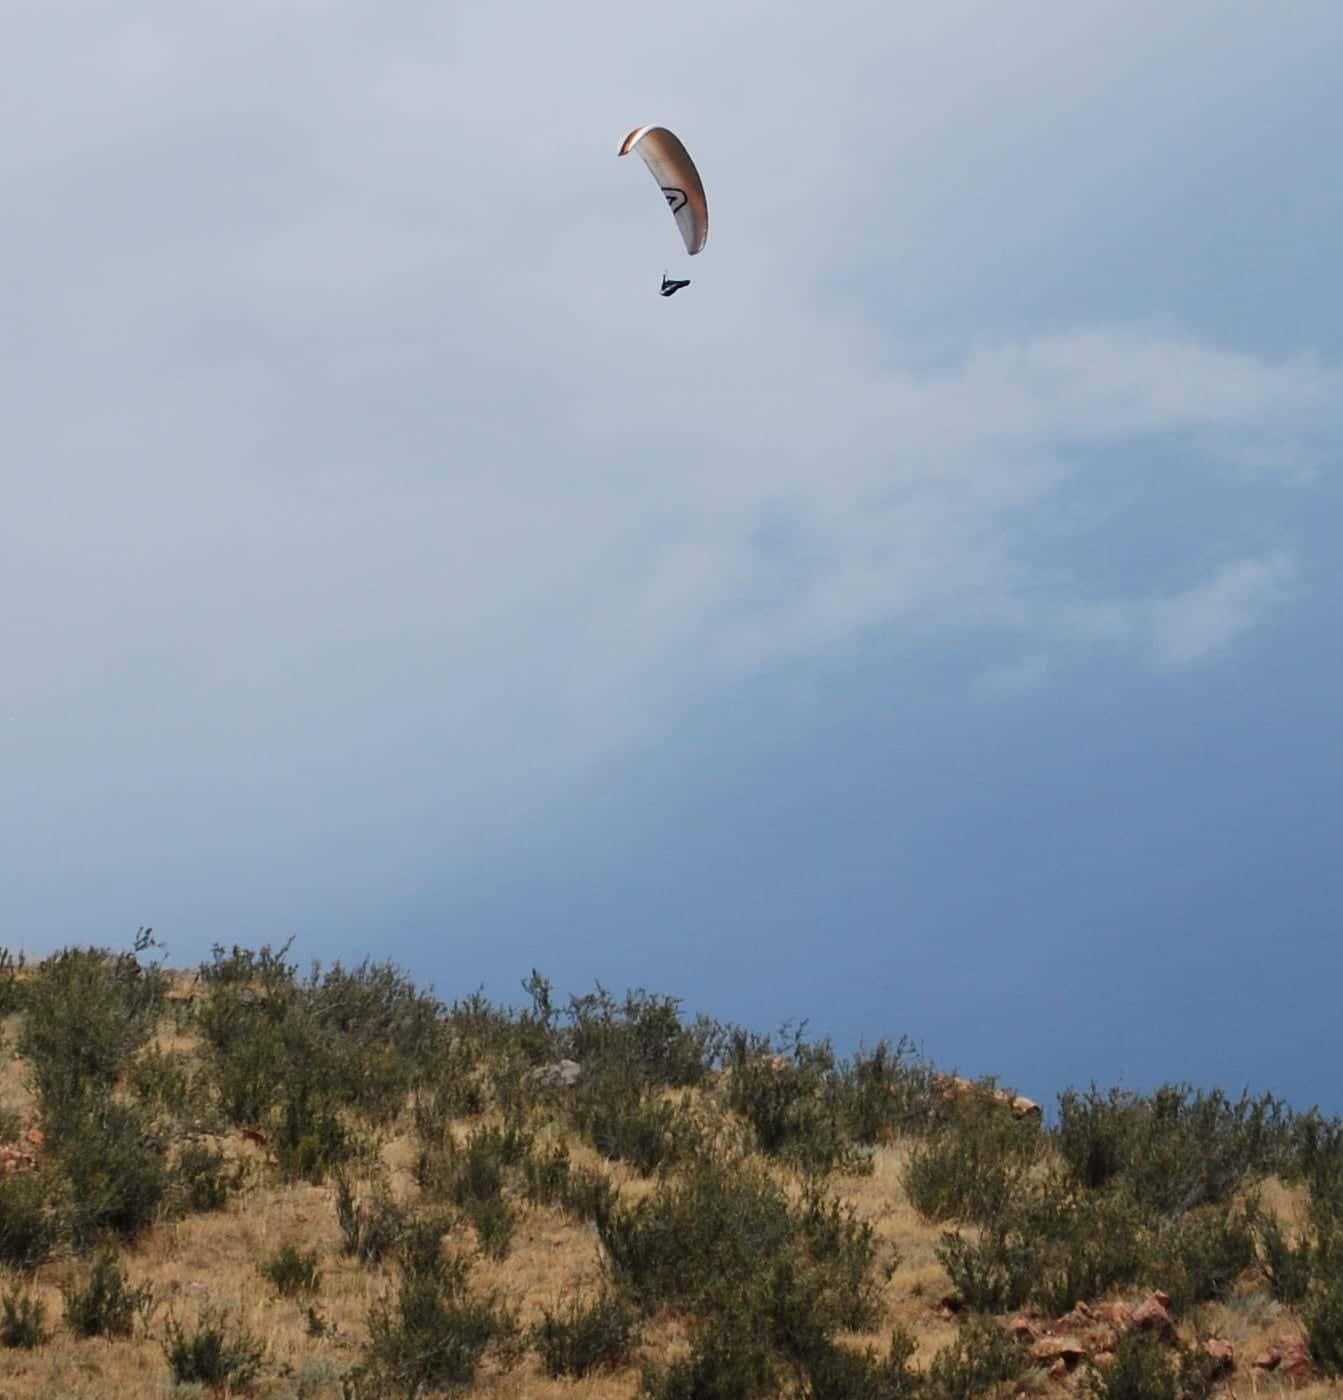 Lookout Mountain Golden Paraglider